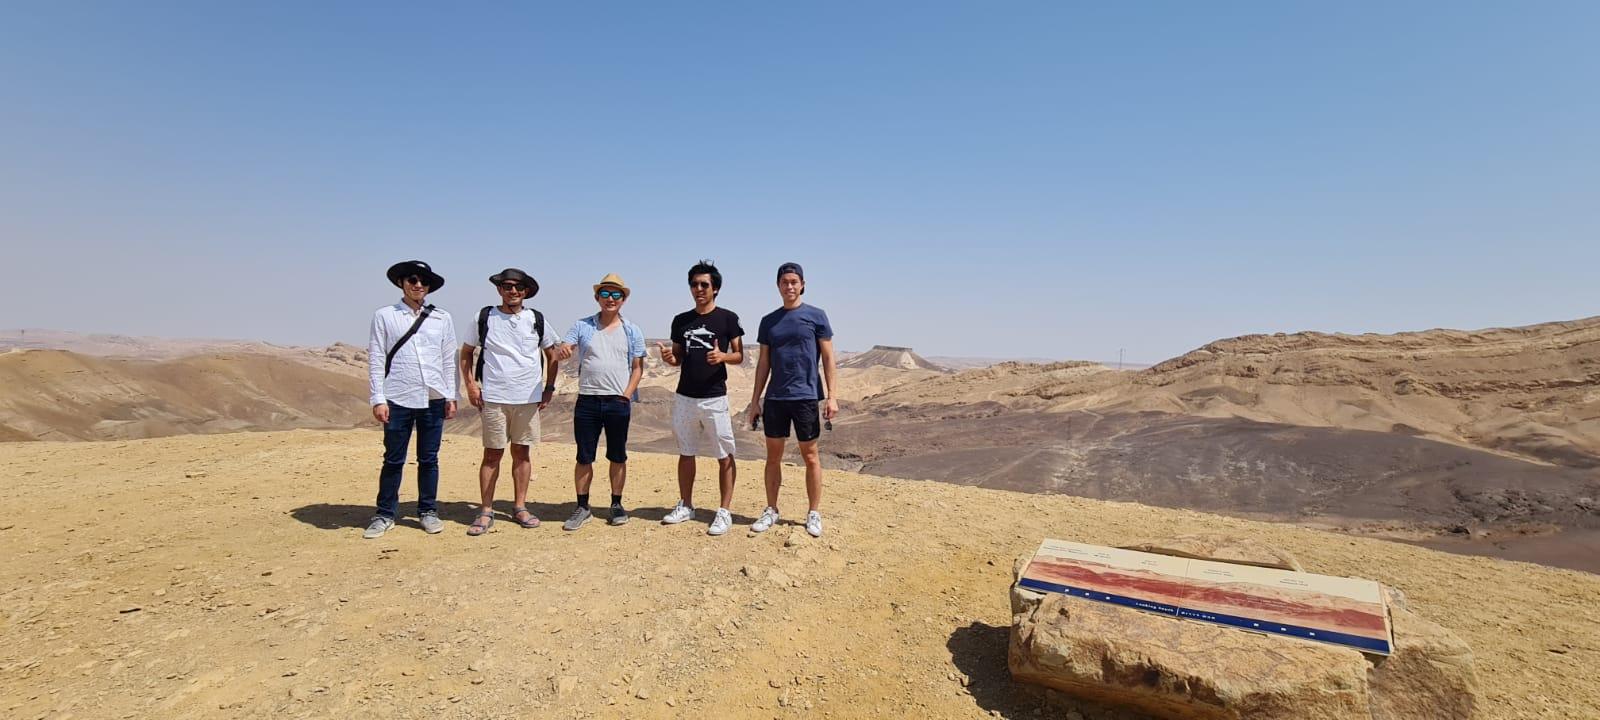 Negev Desert Jeep Tours & Safaris_1